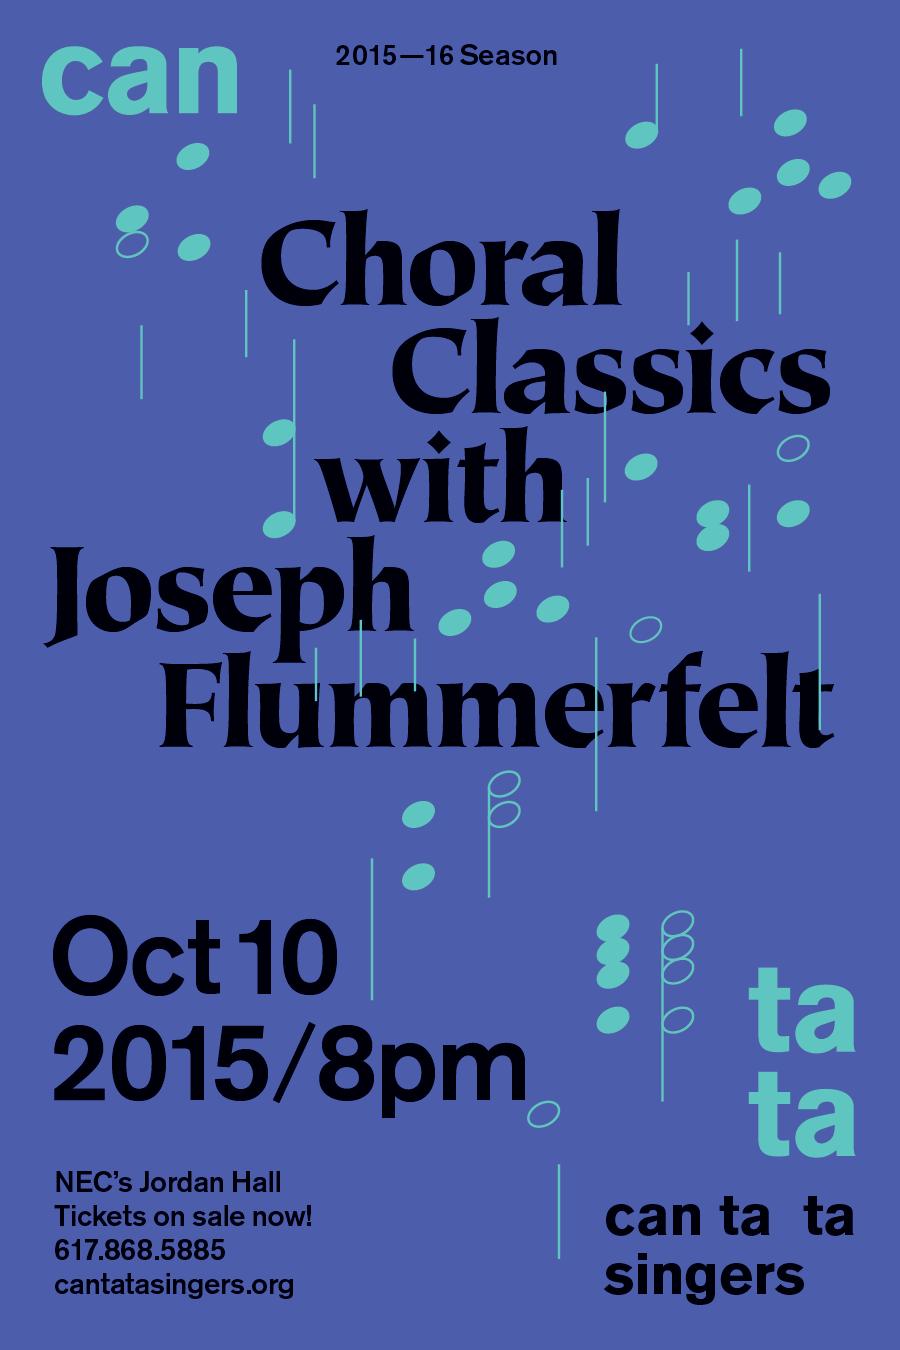 Choral Classics with Joseph Flummerfelt